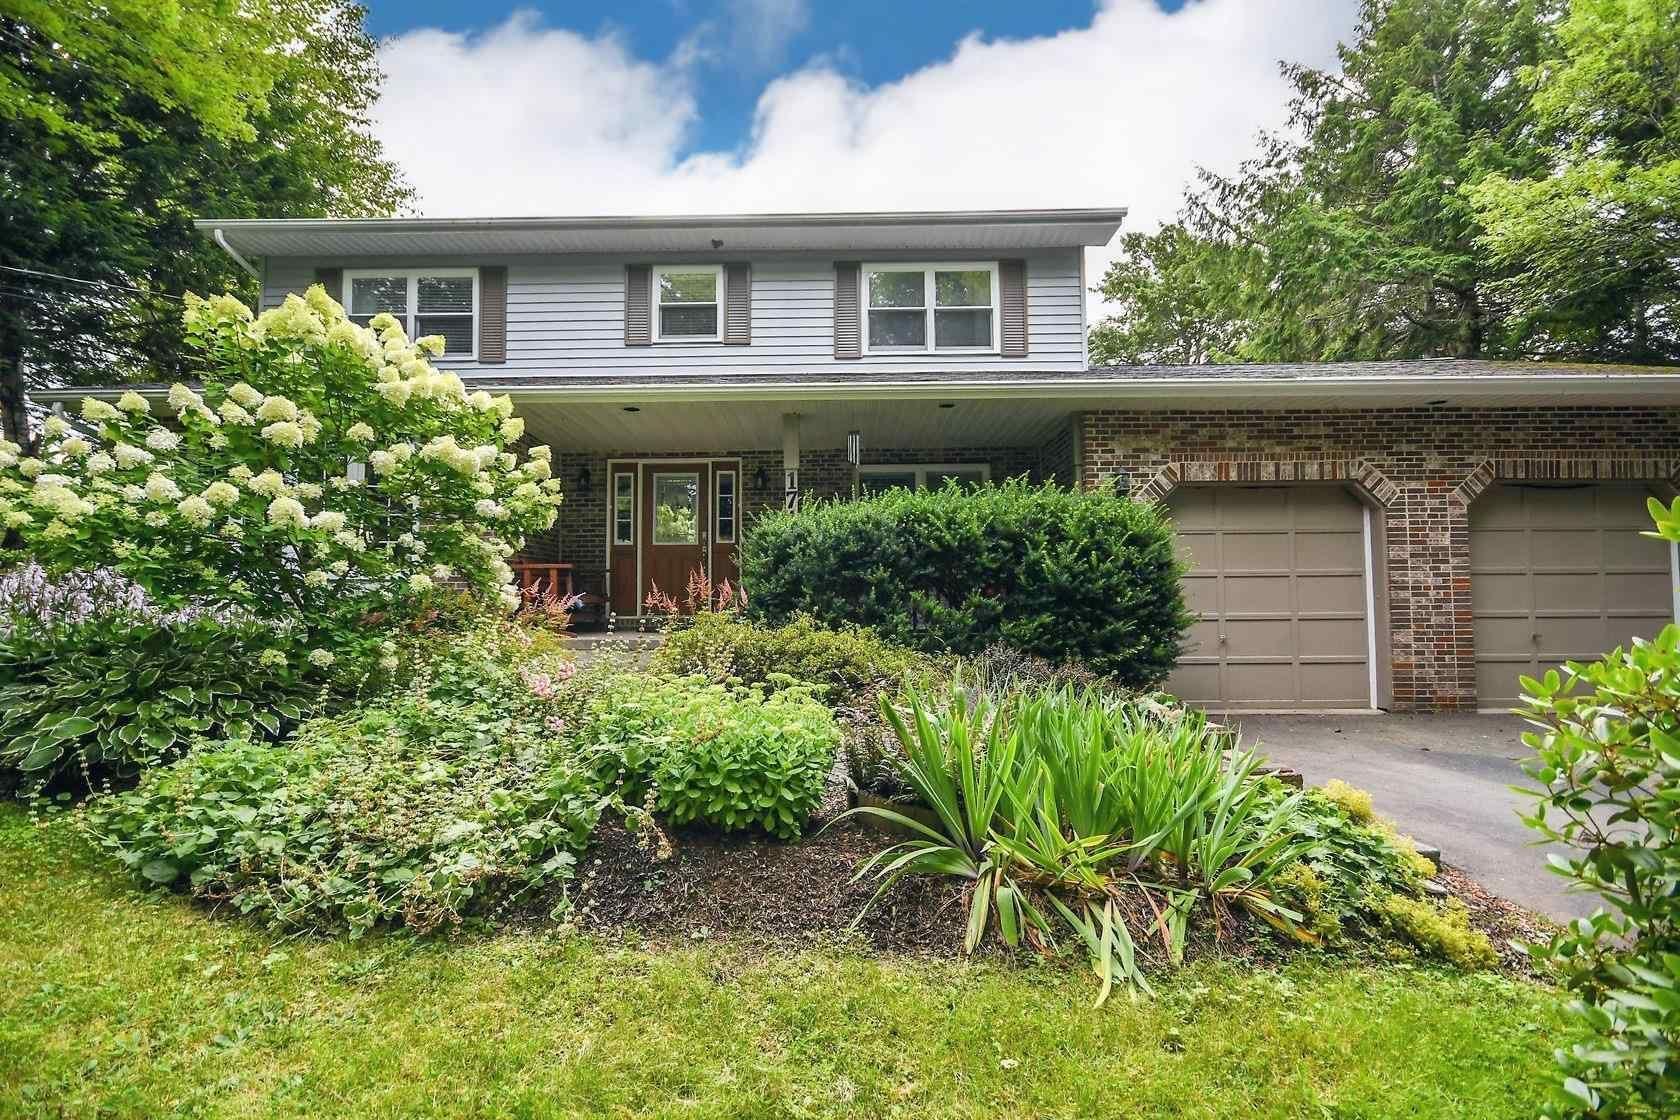 Main Photo: 171 Micmac Drive in Hammonds Plains: 21-Kingswood, Haliburton Hills, Hammonds Pl. Residential for sale (Halifax-Dartmouth)  : MLS®# 202120736